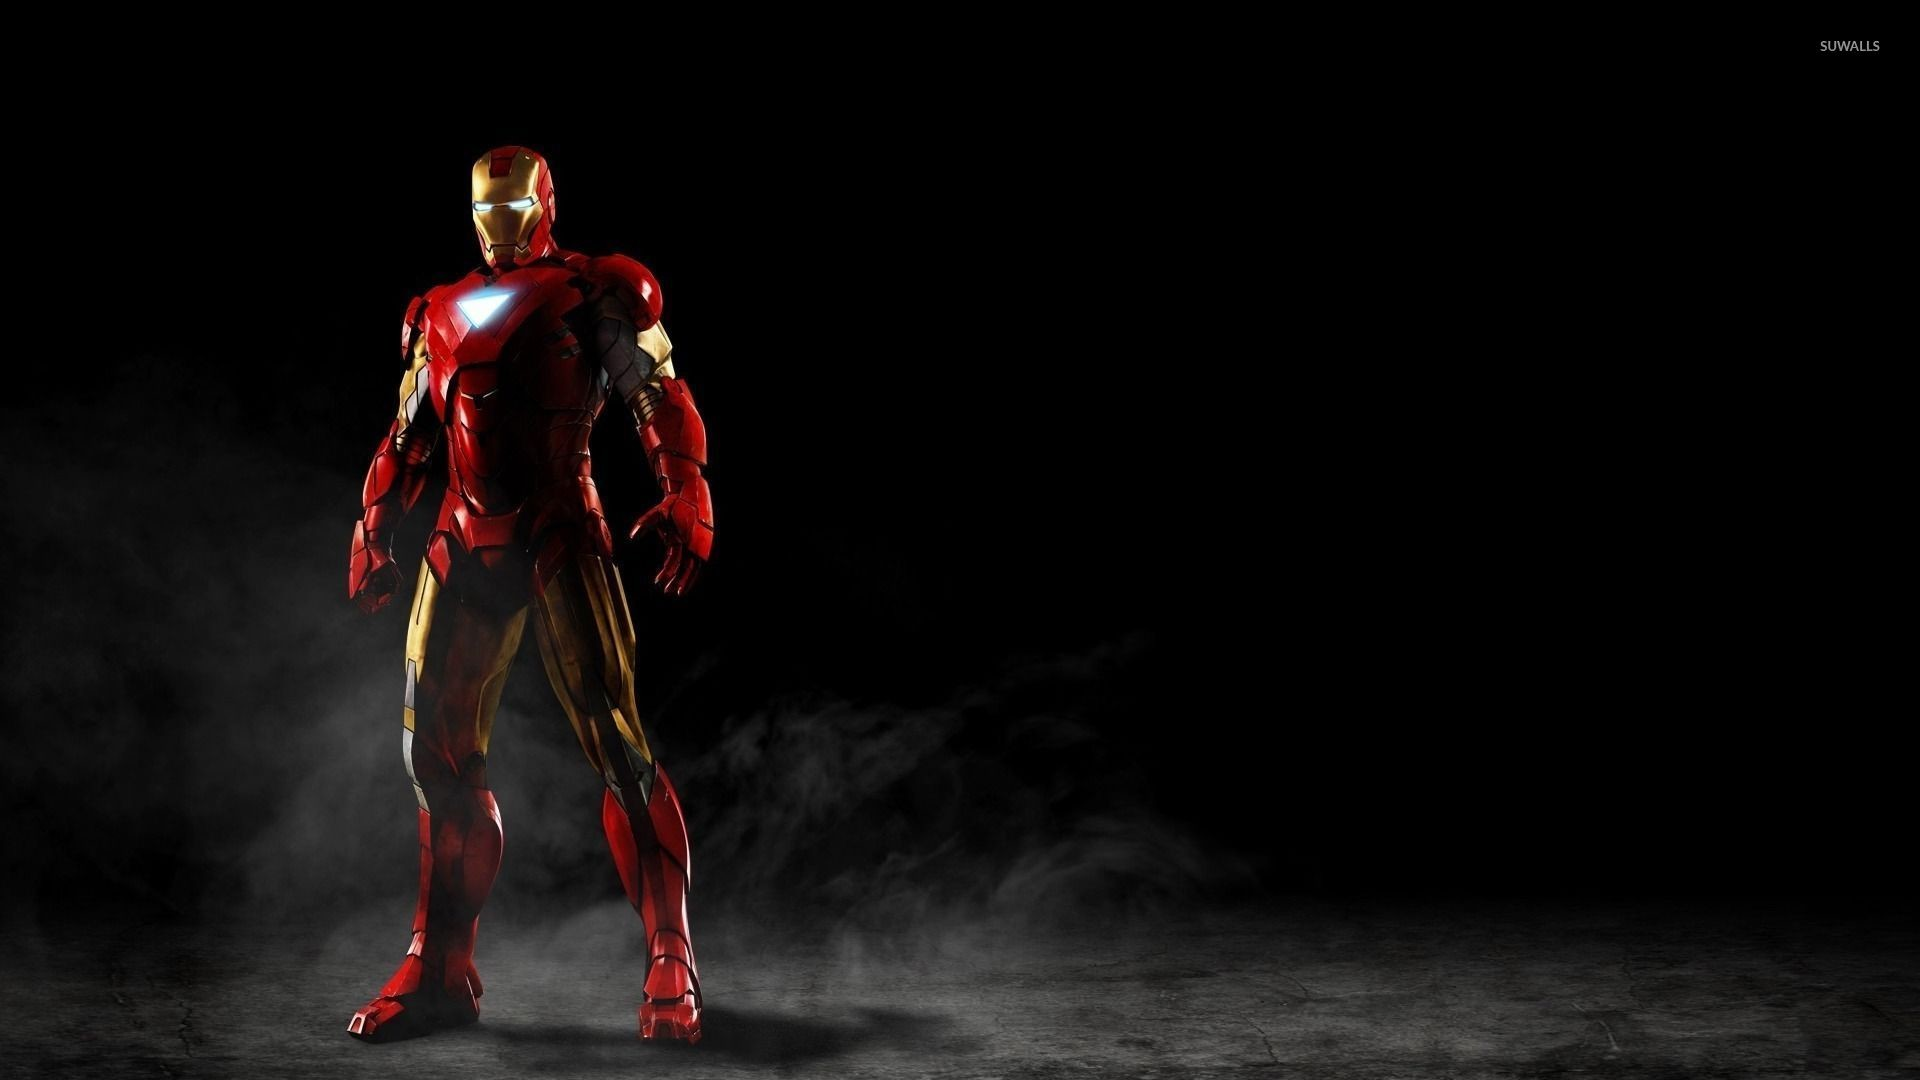 Iron Man standing in the smoke wallpaper jpg